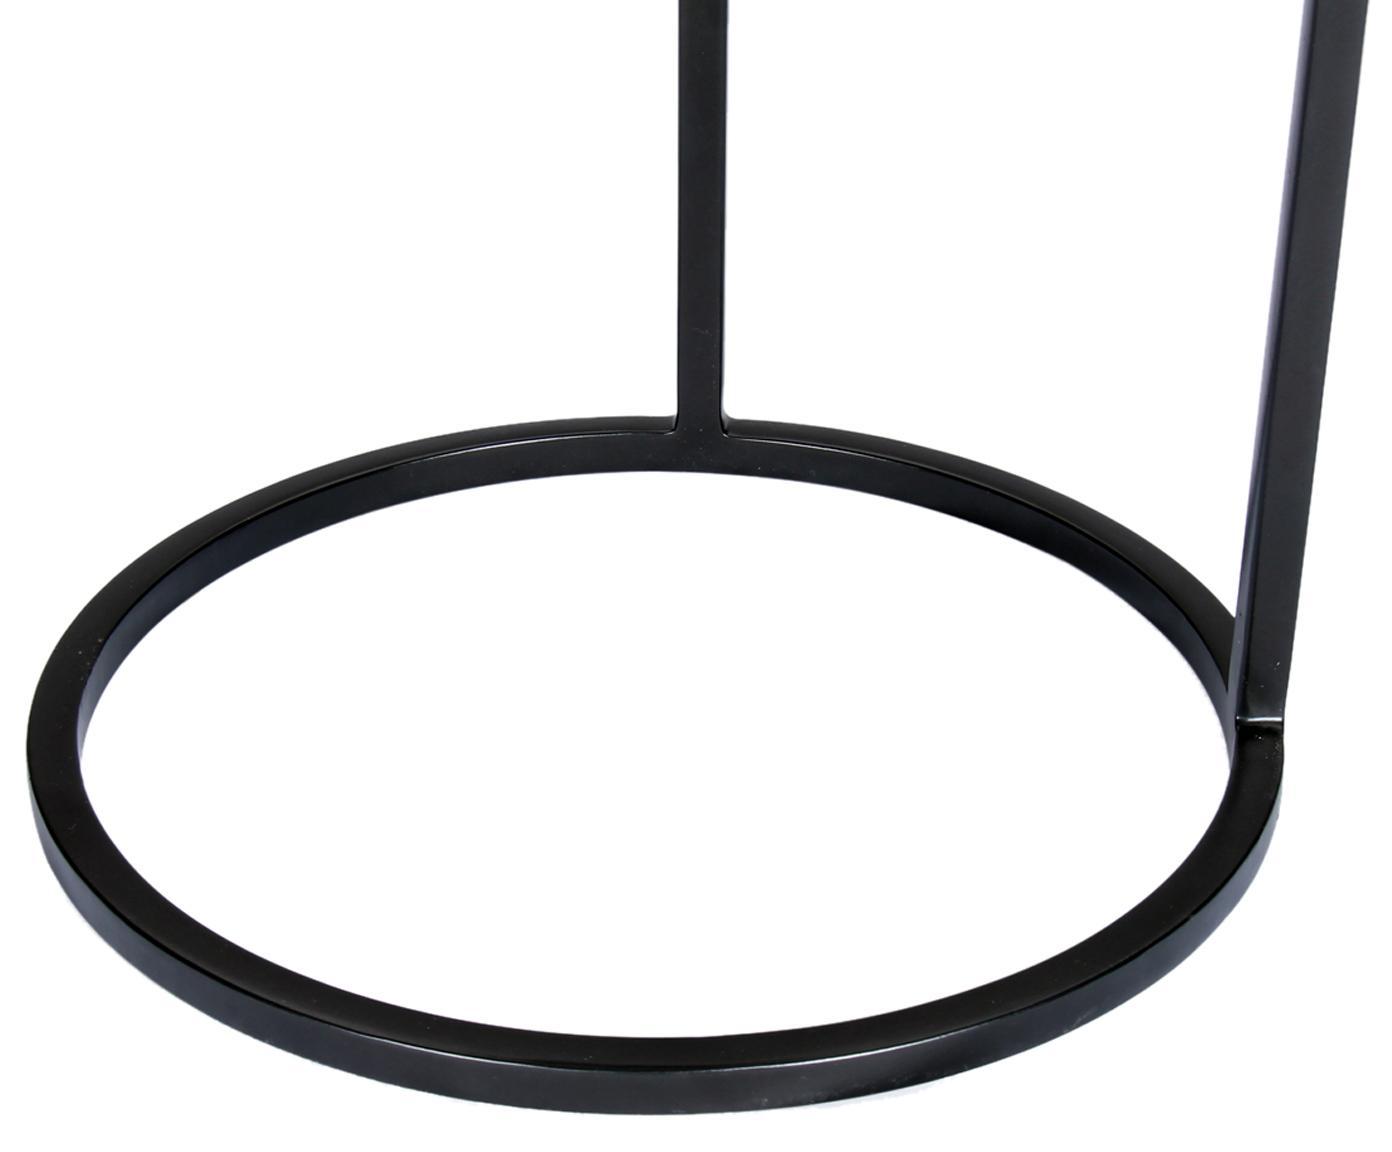 Runder Beistelltisch Circle aus Metall, Tischplatte: Metall, beschichtet, Gestell: Metall, pulverbeschichtet, Silber, Schwarz, Ø 36 x H 66 cm